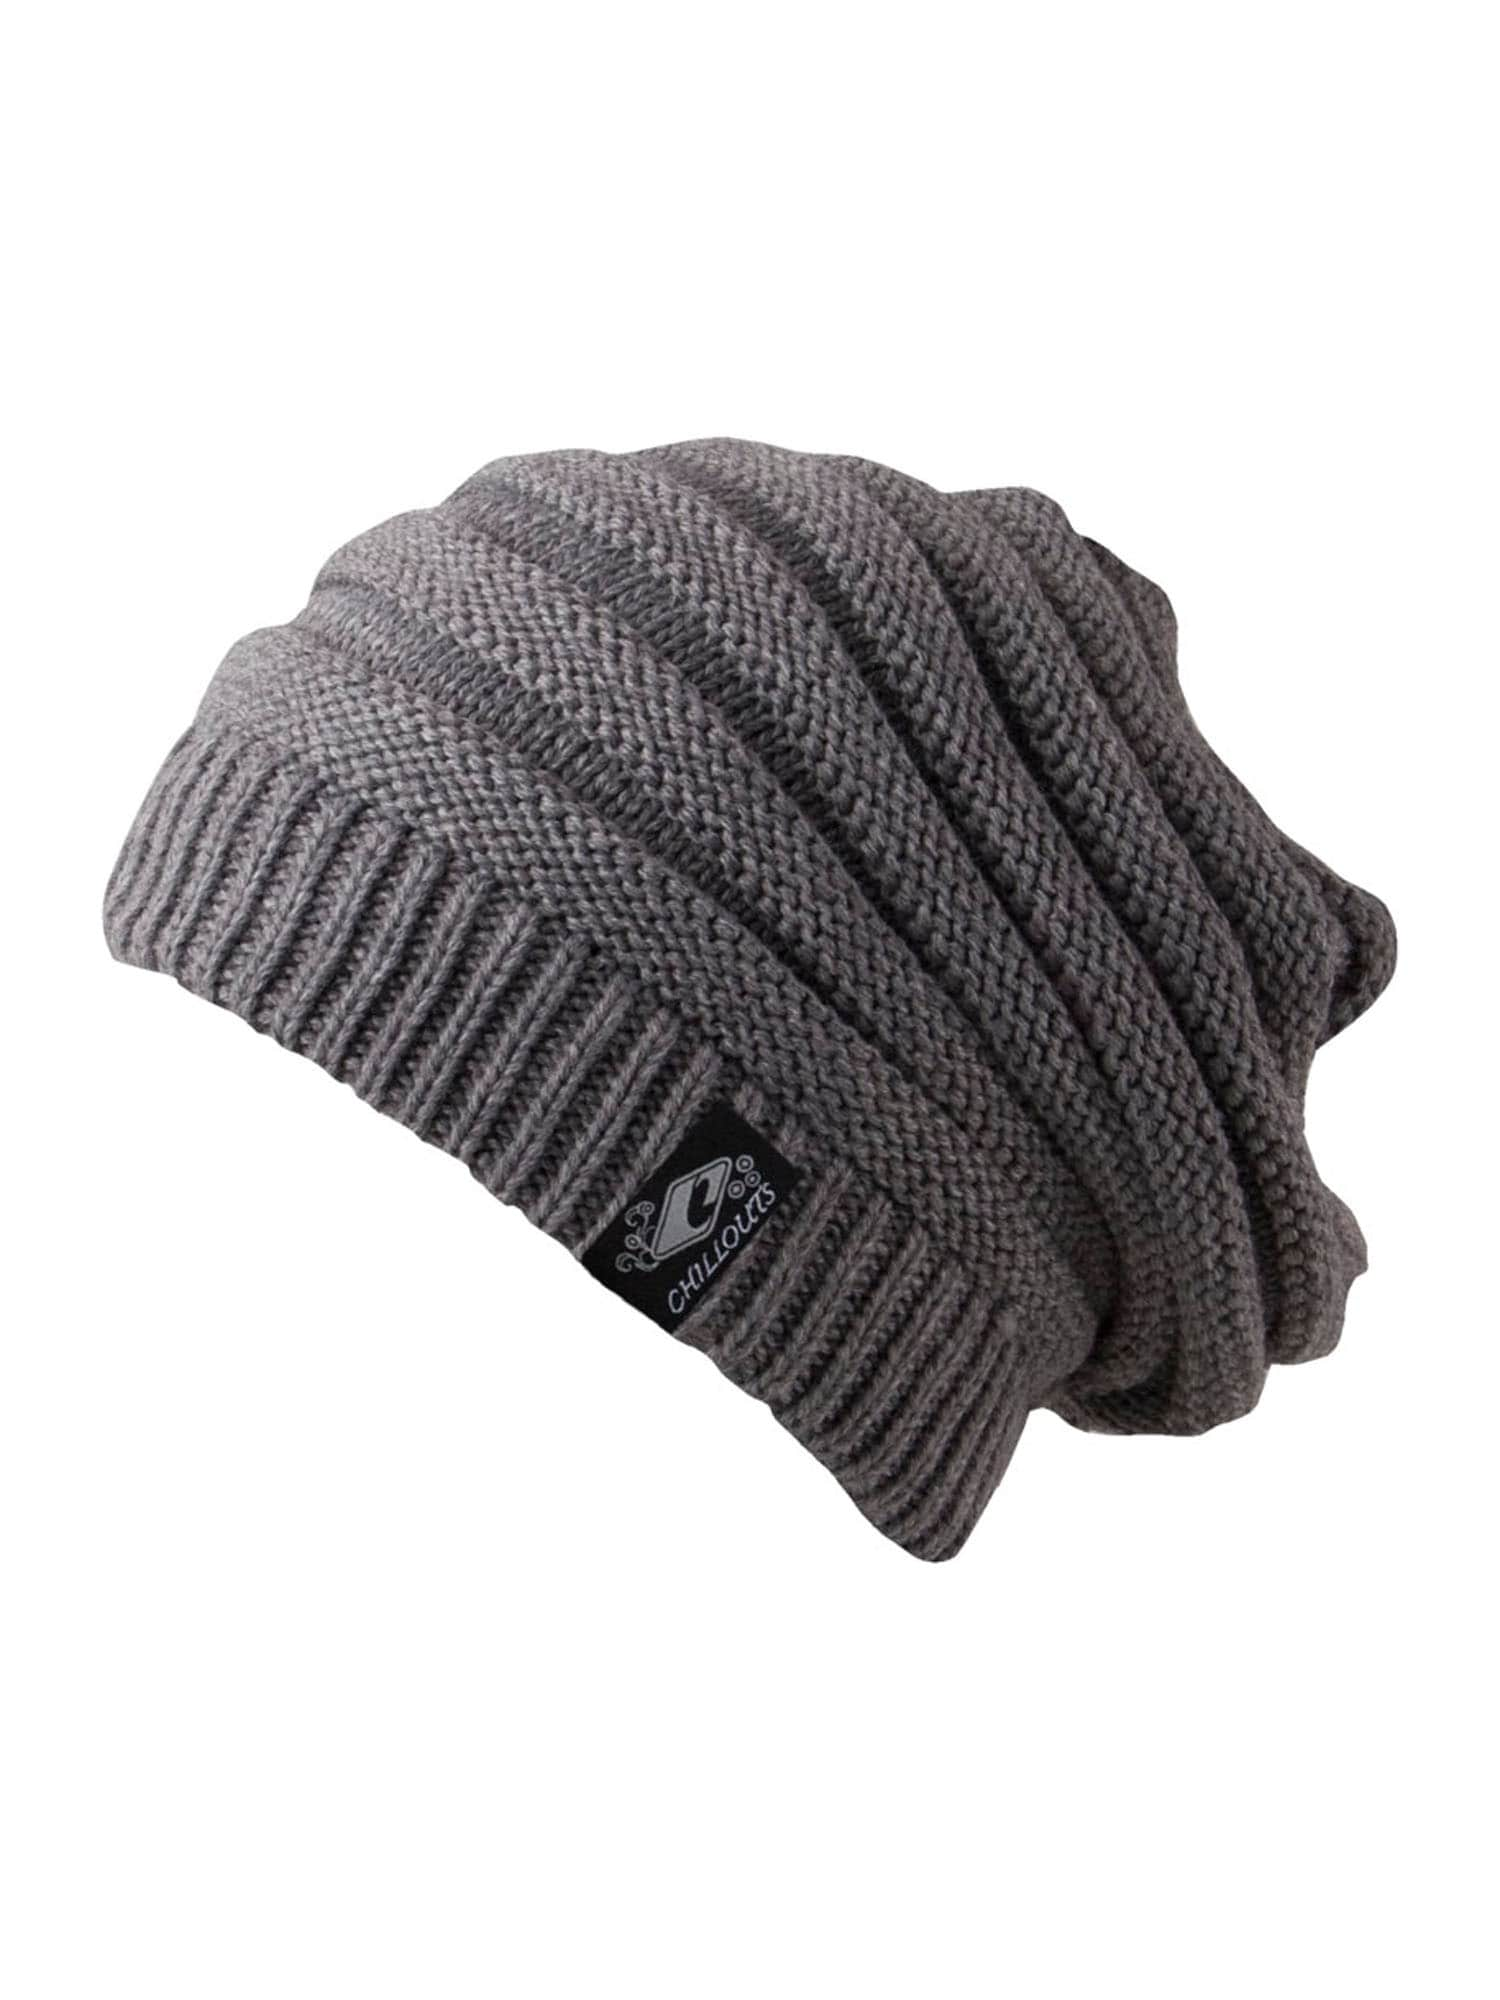 chillouts Megzta kepurė 'Brian' pilka